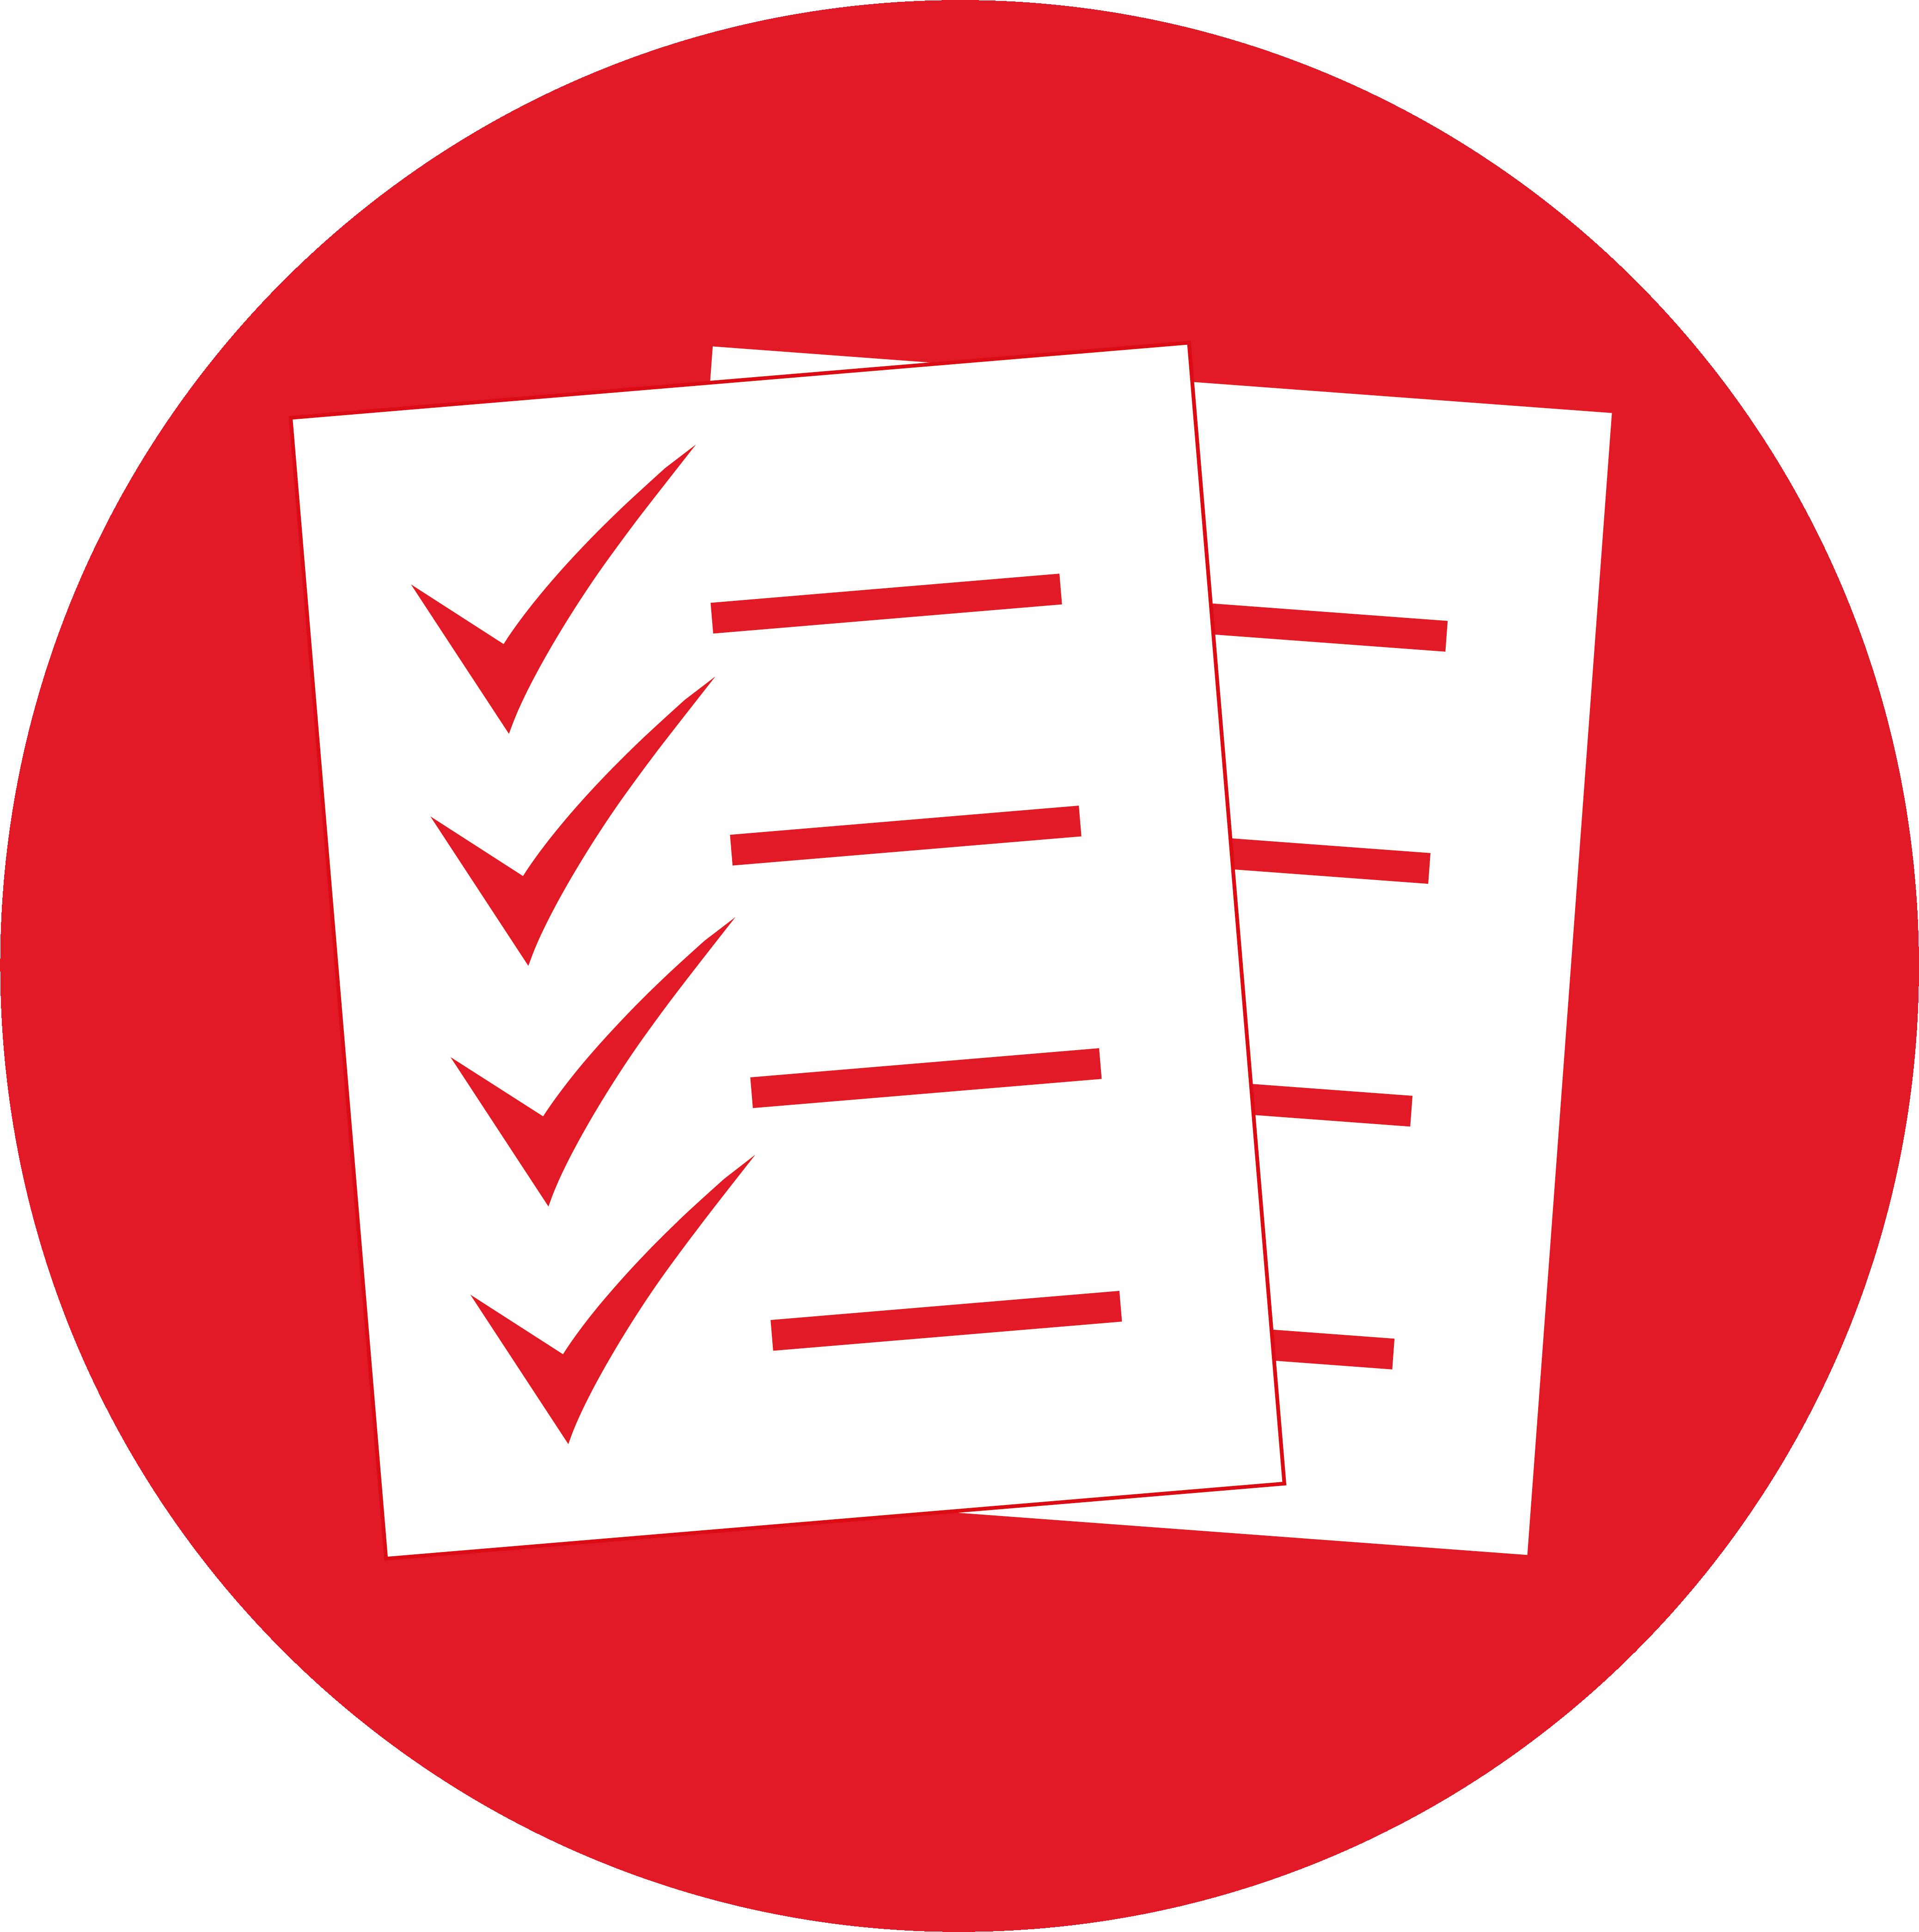 Business SLA icon